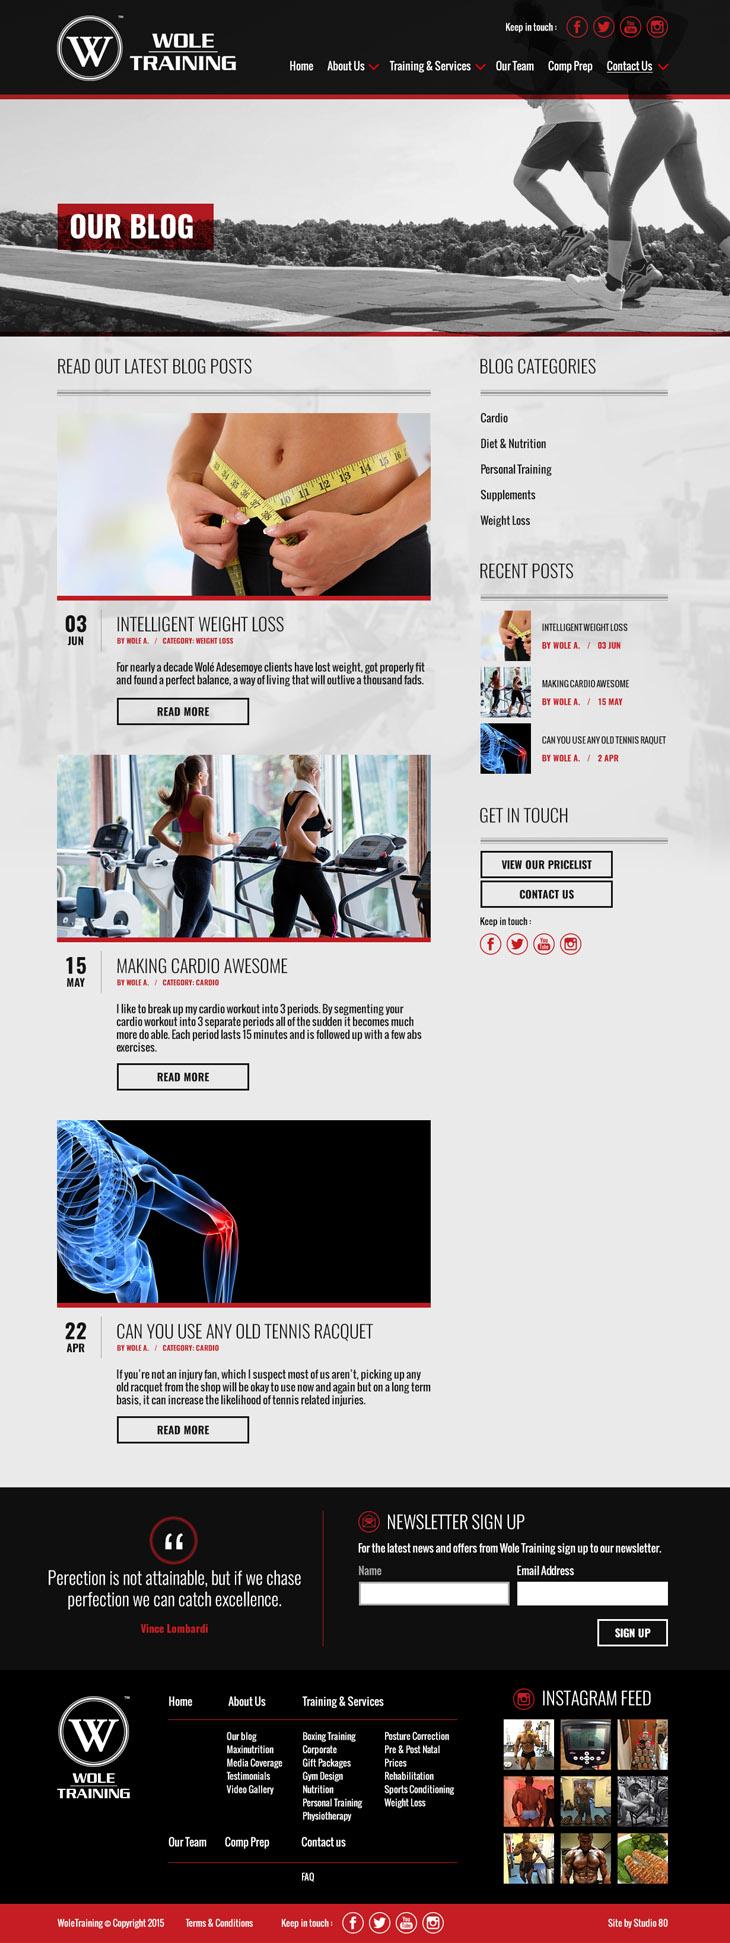 WoleTraining Responsive Web Design